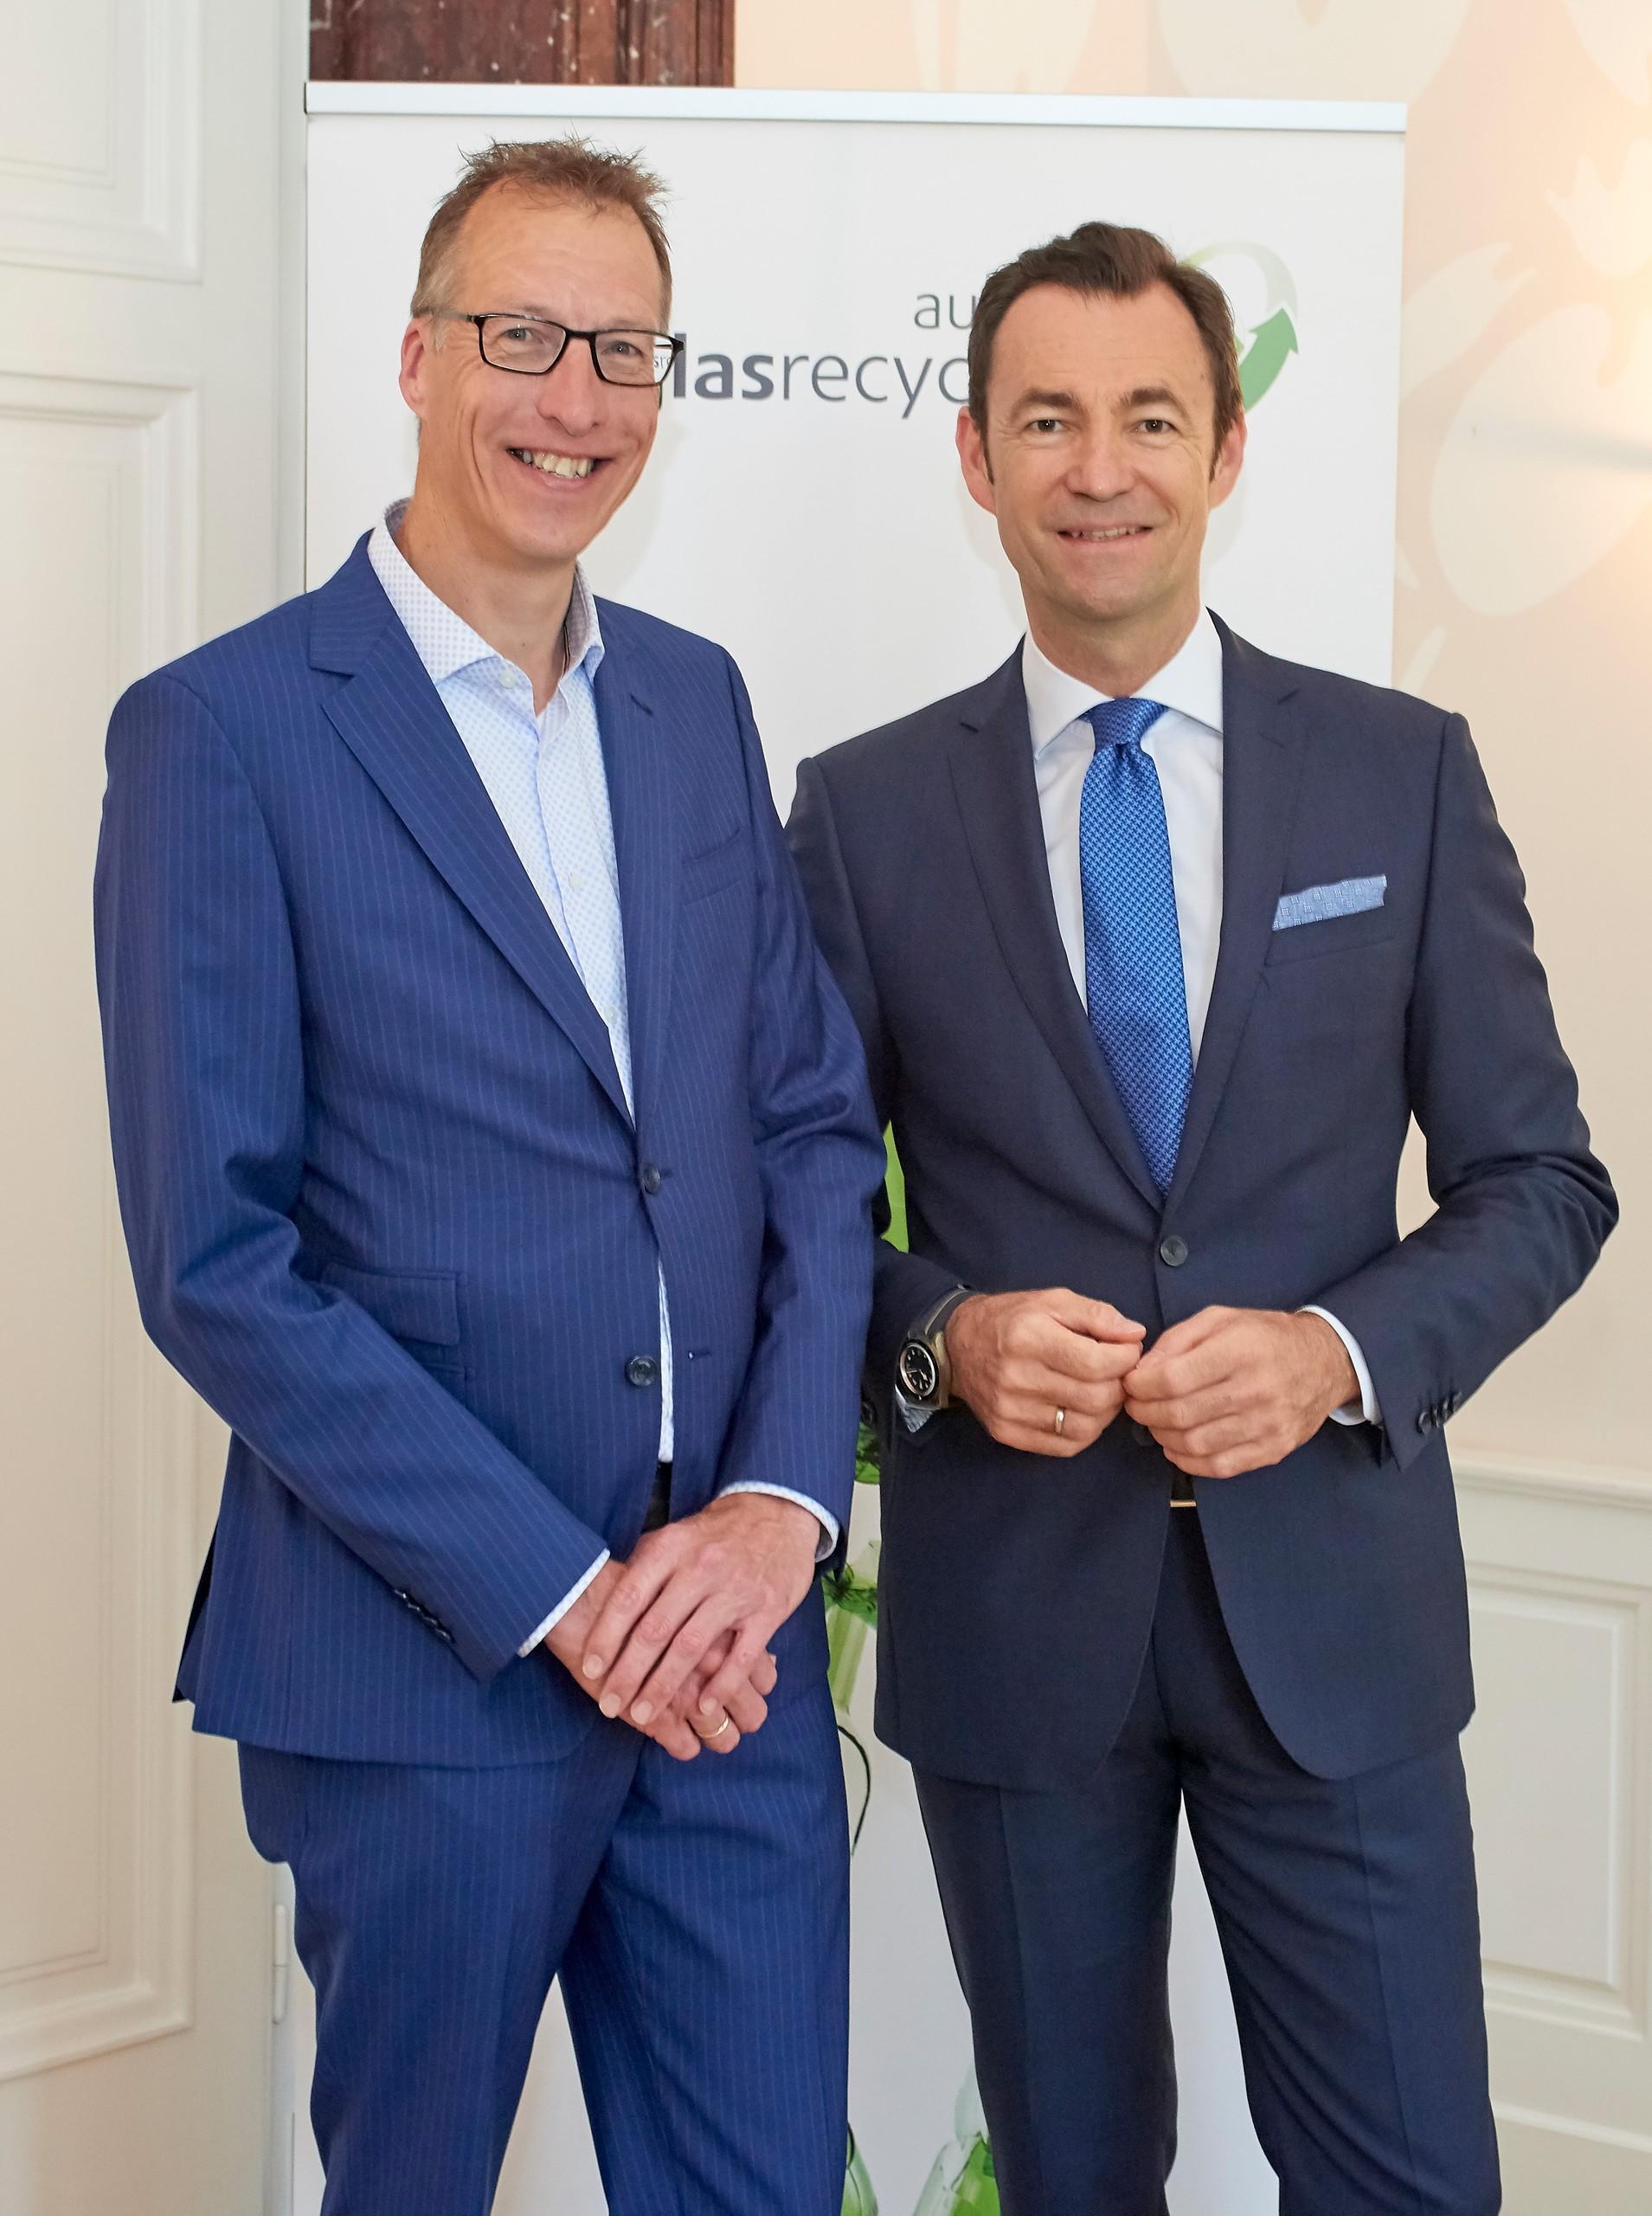 Austria Glas ReCIRCLE, 14.Mai 2018, Toine Timmermans und Harald Hauke